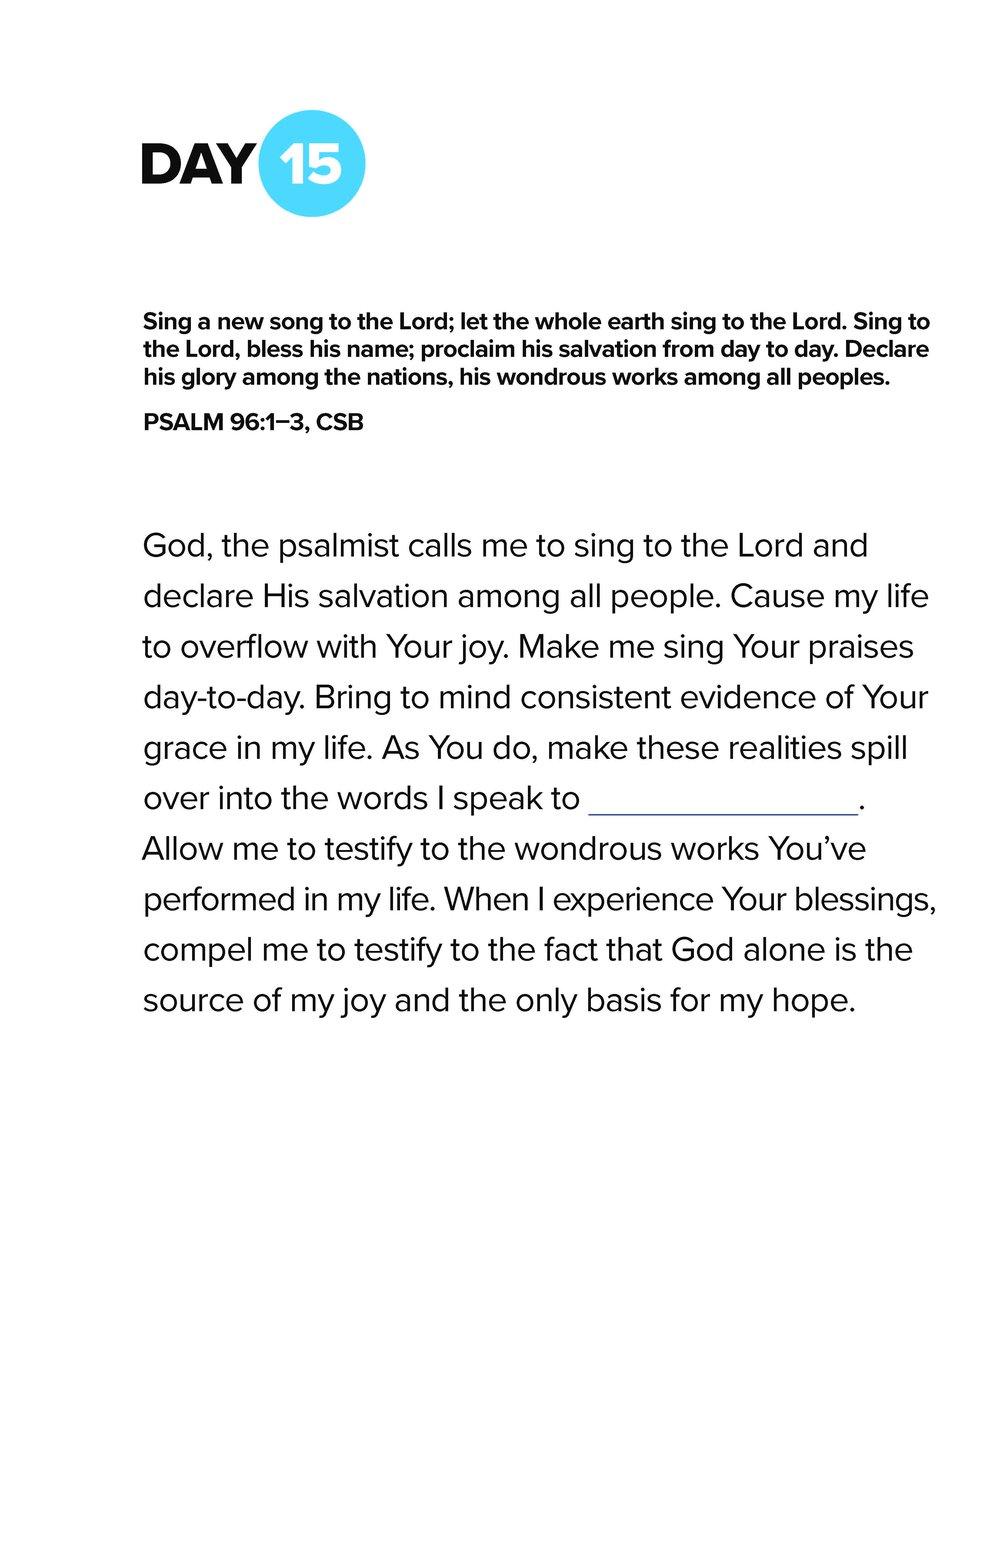 WhosYour1_Prayer-Guide_day15.jpg